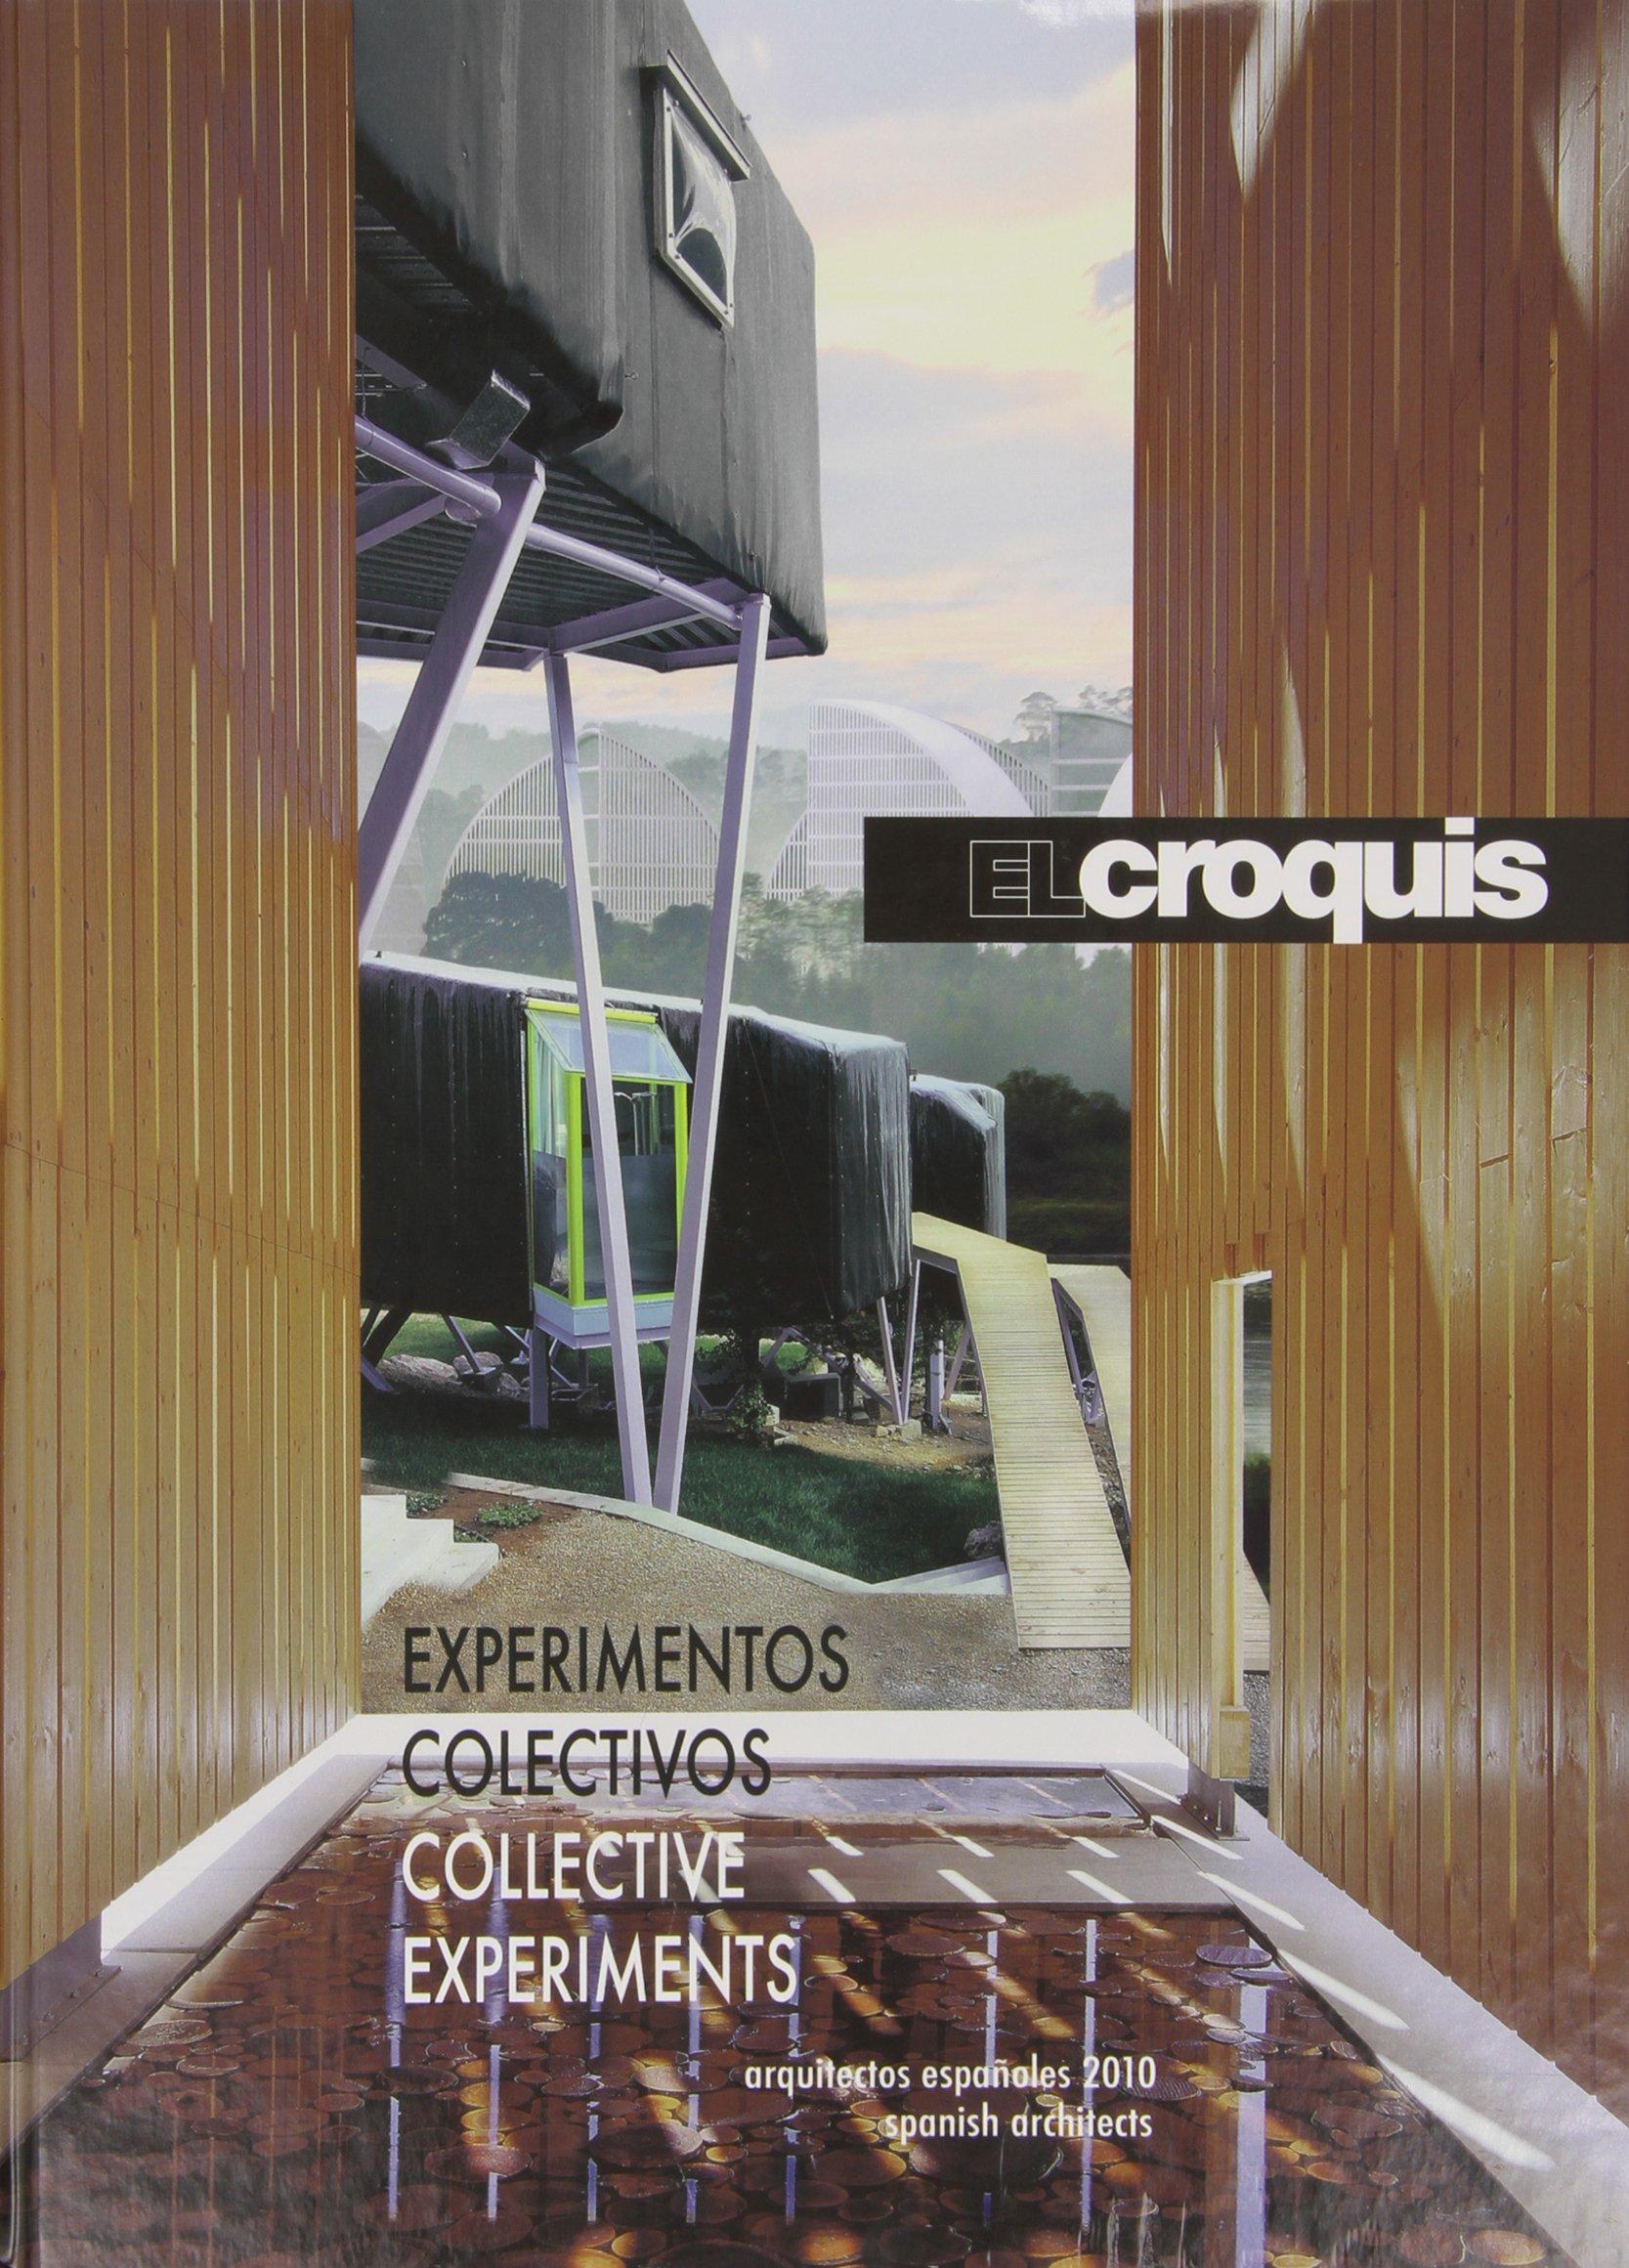 Croquis 148/149 - experimentos colectivos (Revista El Croquis) (Inglés) Tapa dura – 28 sep 2010 Aa.Vv. 8488386605 c 2010 to c 2020 Architecture